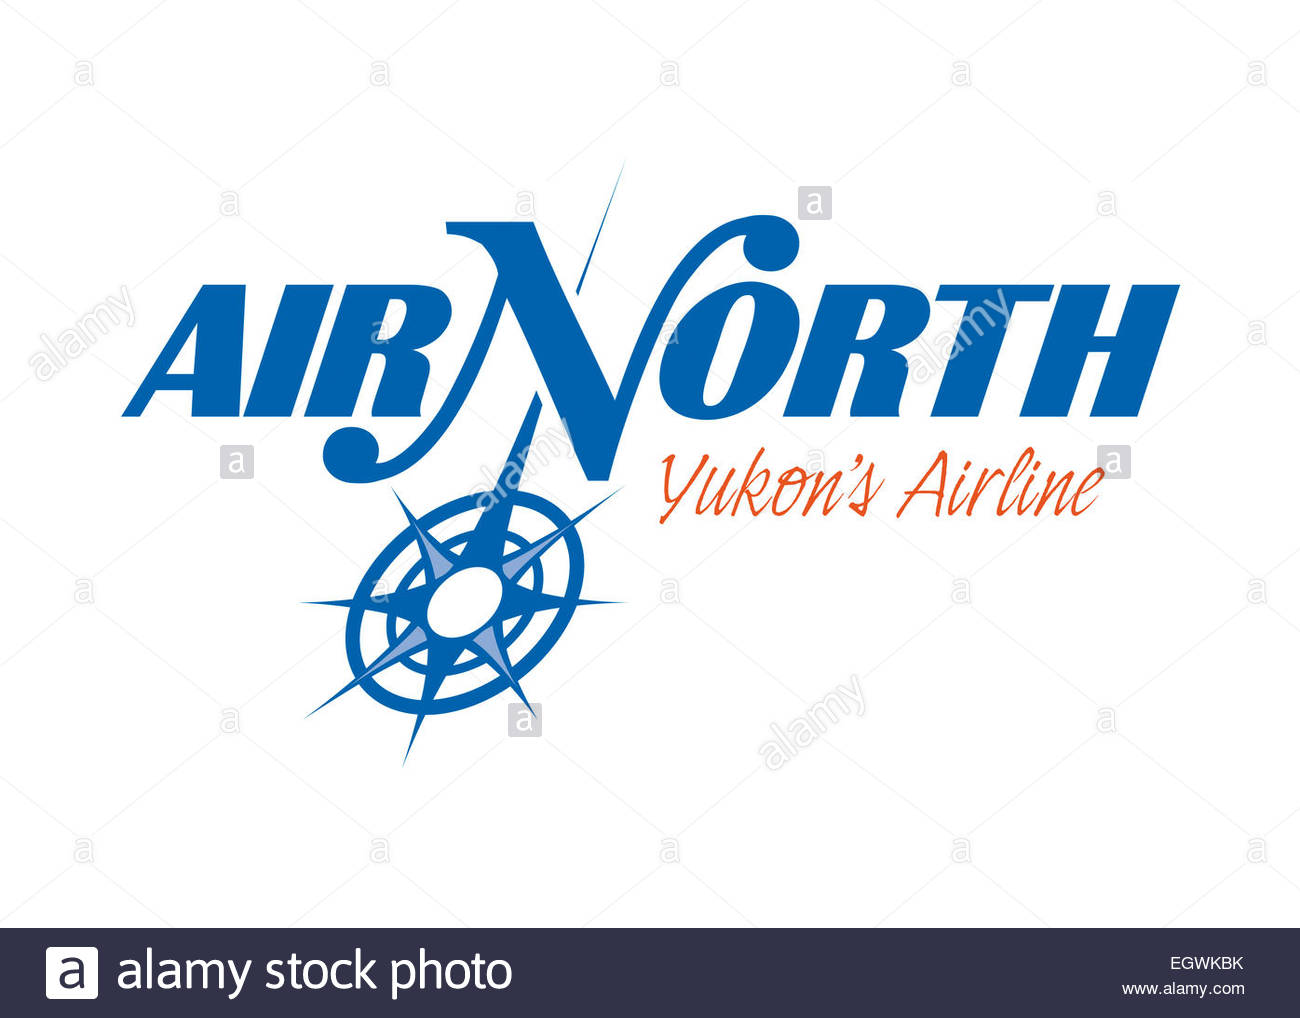 Air North - Yukon's Airline logo symbol flag emblem - Stock Image